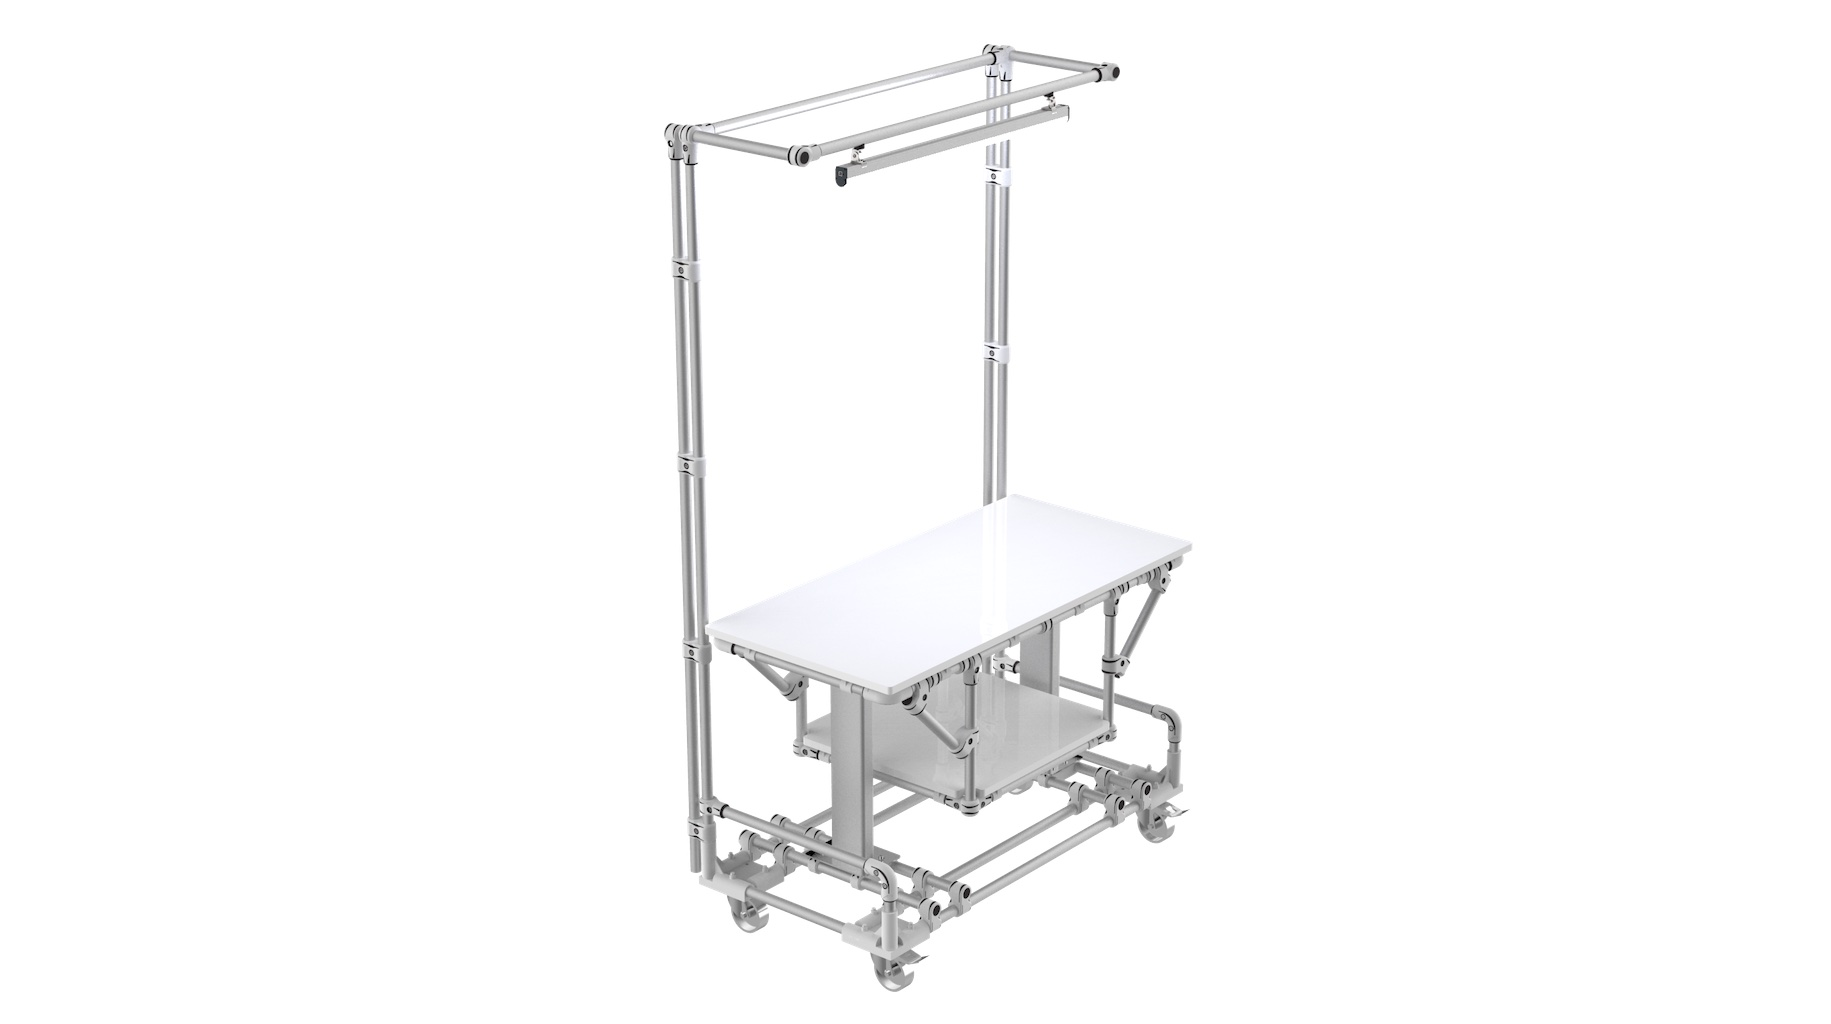 Industry - Ergonomic mobile bespoke technical workbench.